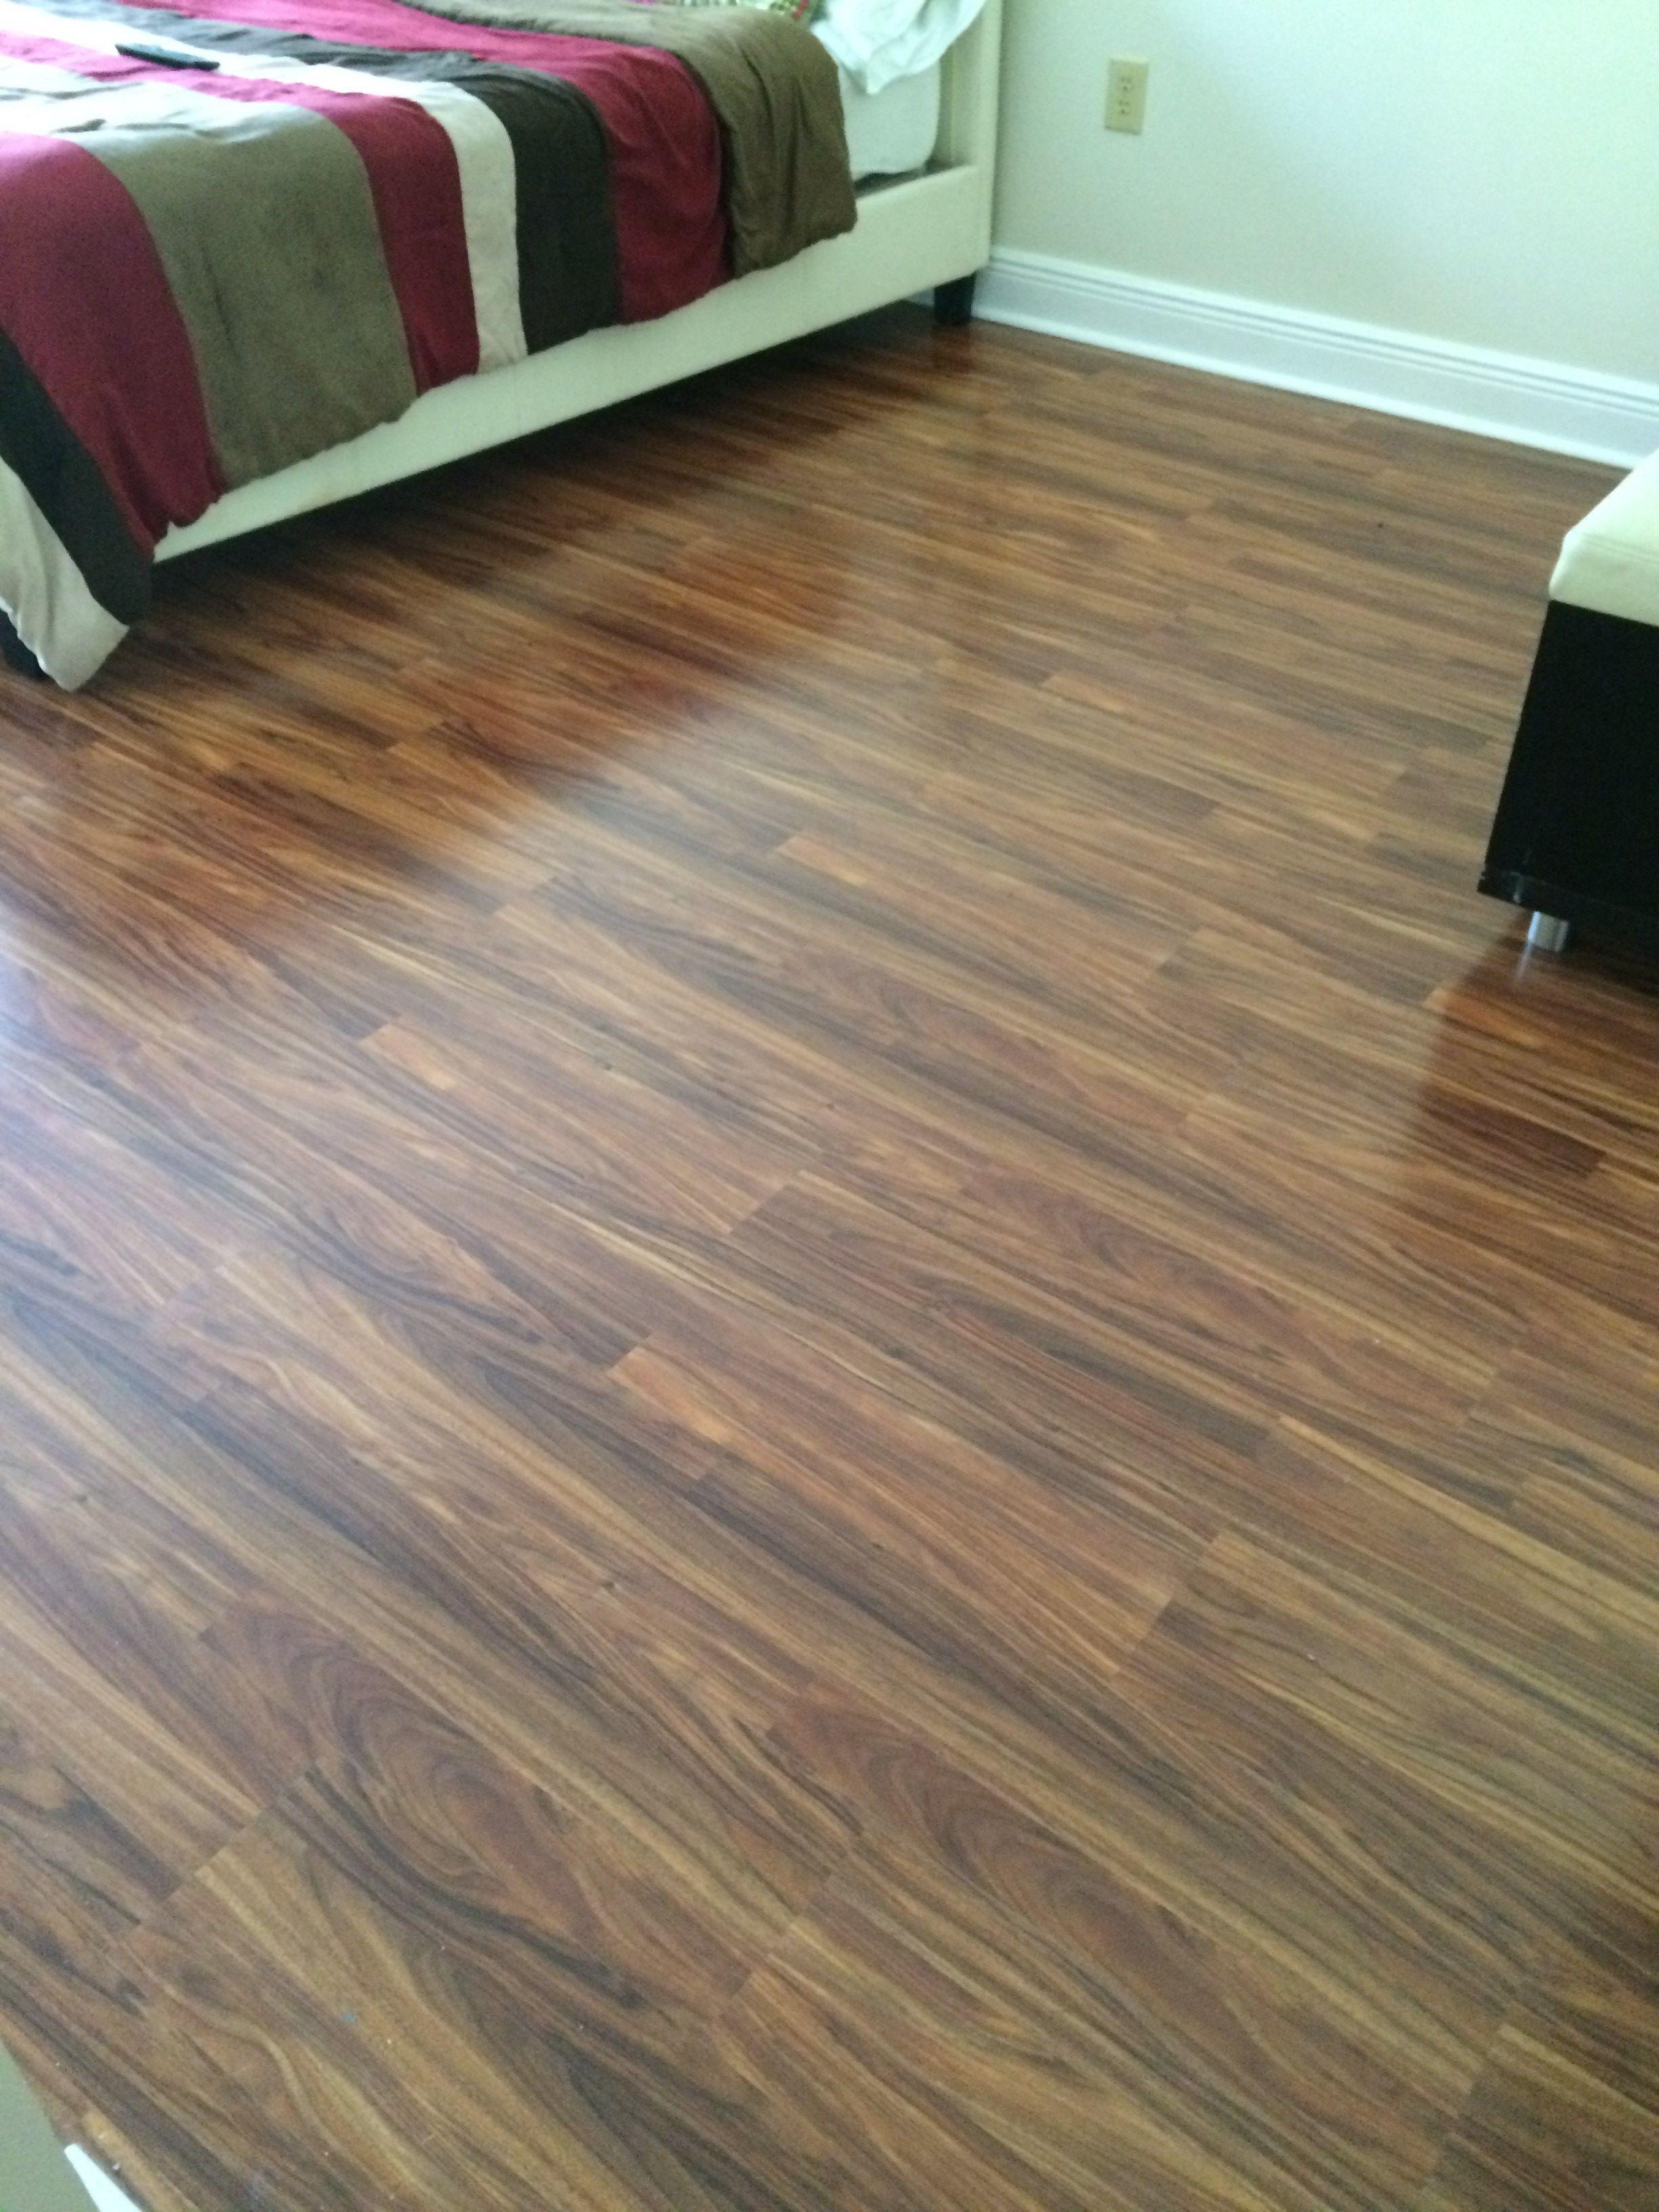 Pergo Fruitwood In A Bedroom From Bruce A Beautiful Contrasting Planks Luxury Vinyl Flooring Buying Flooring Flooring